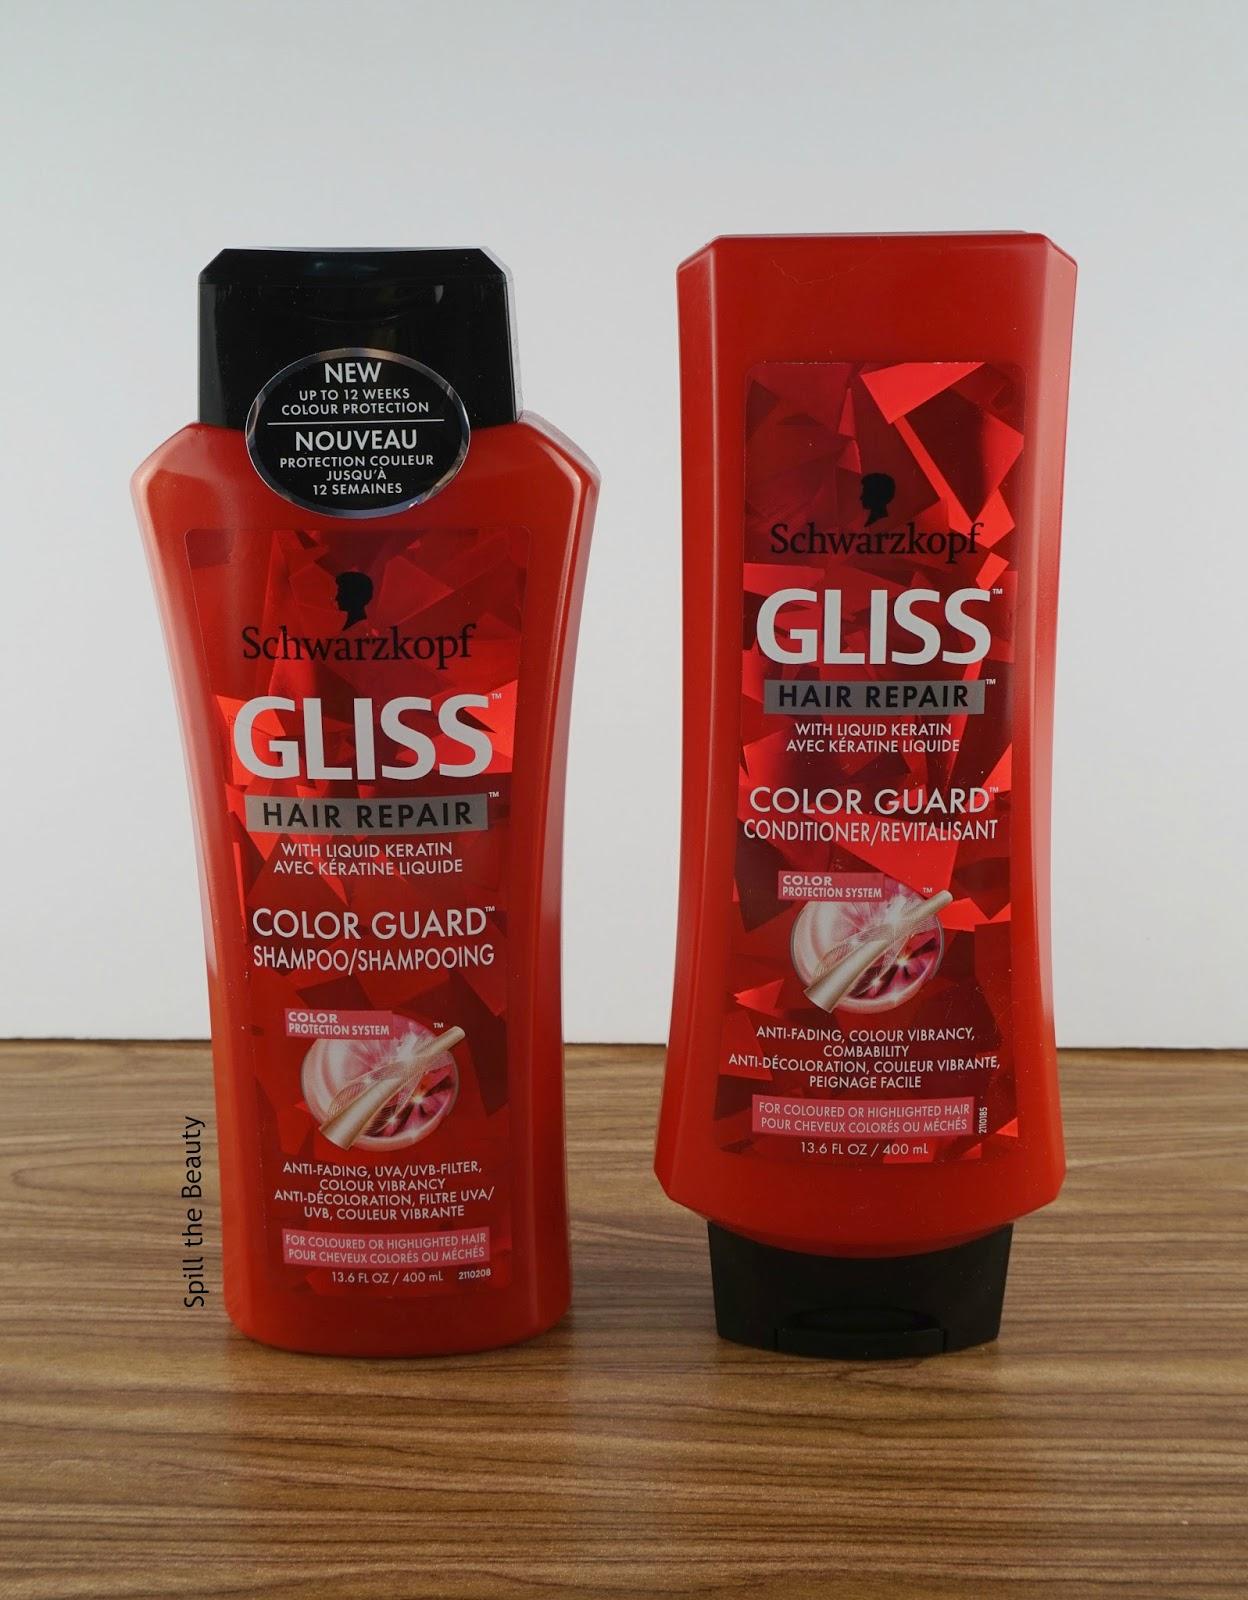 gliss color guard shampoo conditioner express repair review